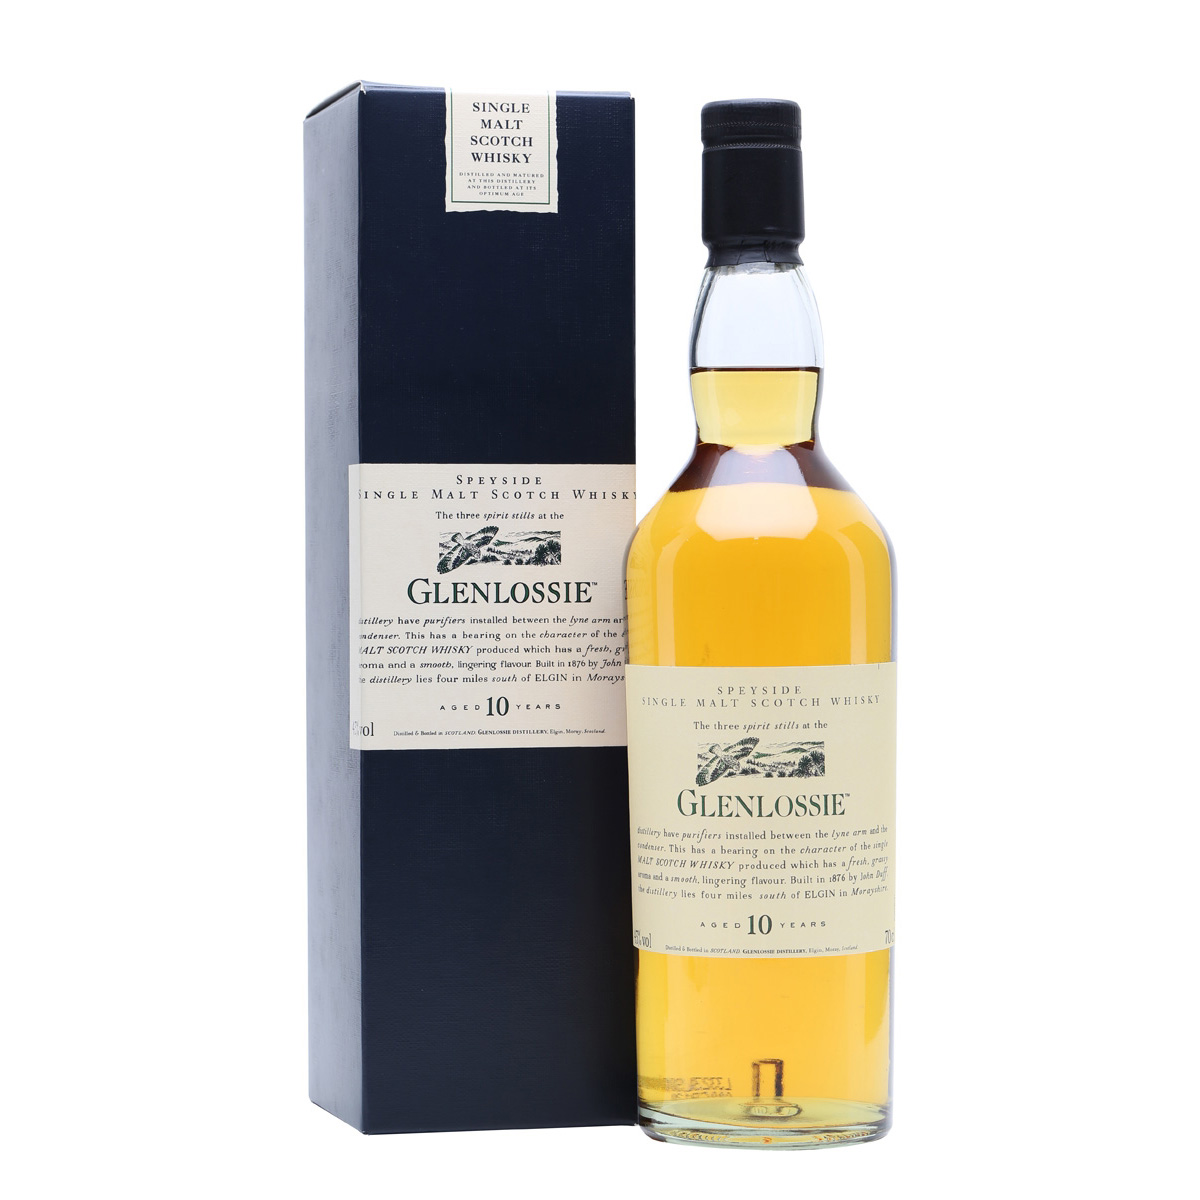 Glenlossie Flora & Fauna 10 Year Old Speyside Single Malt Scotch Whisky